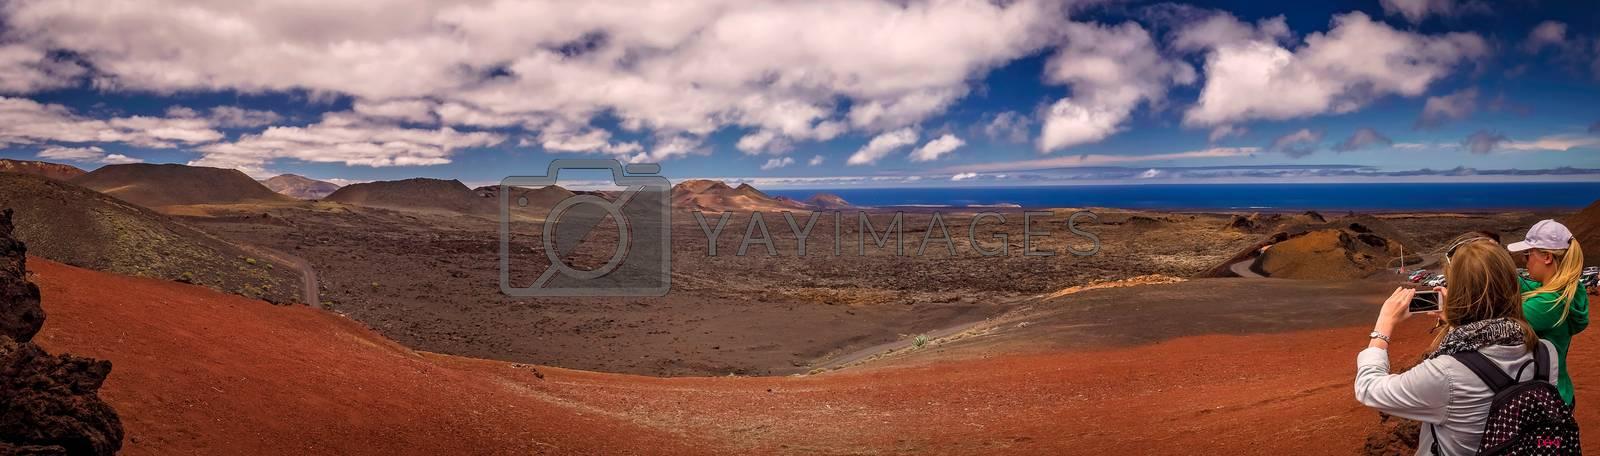 Royalty free image of Timanfaya National Park  by pawopa3336